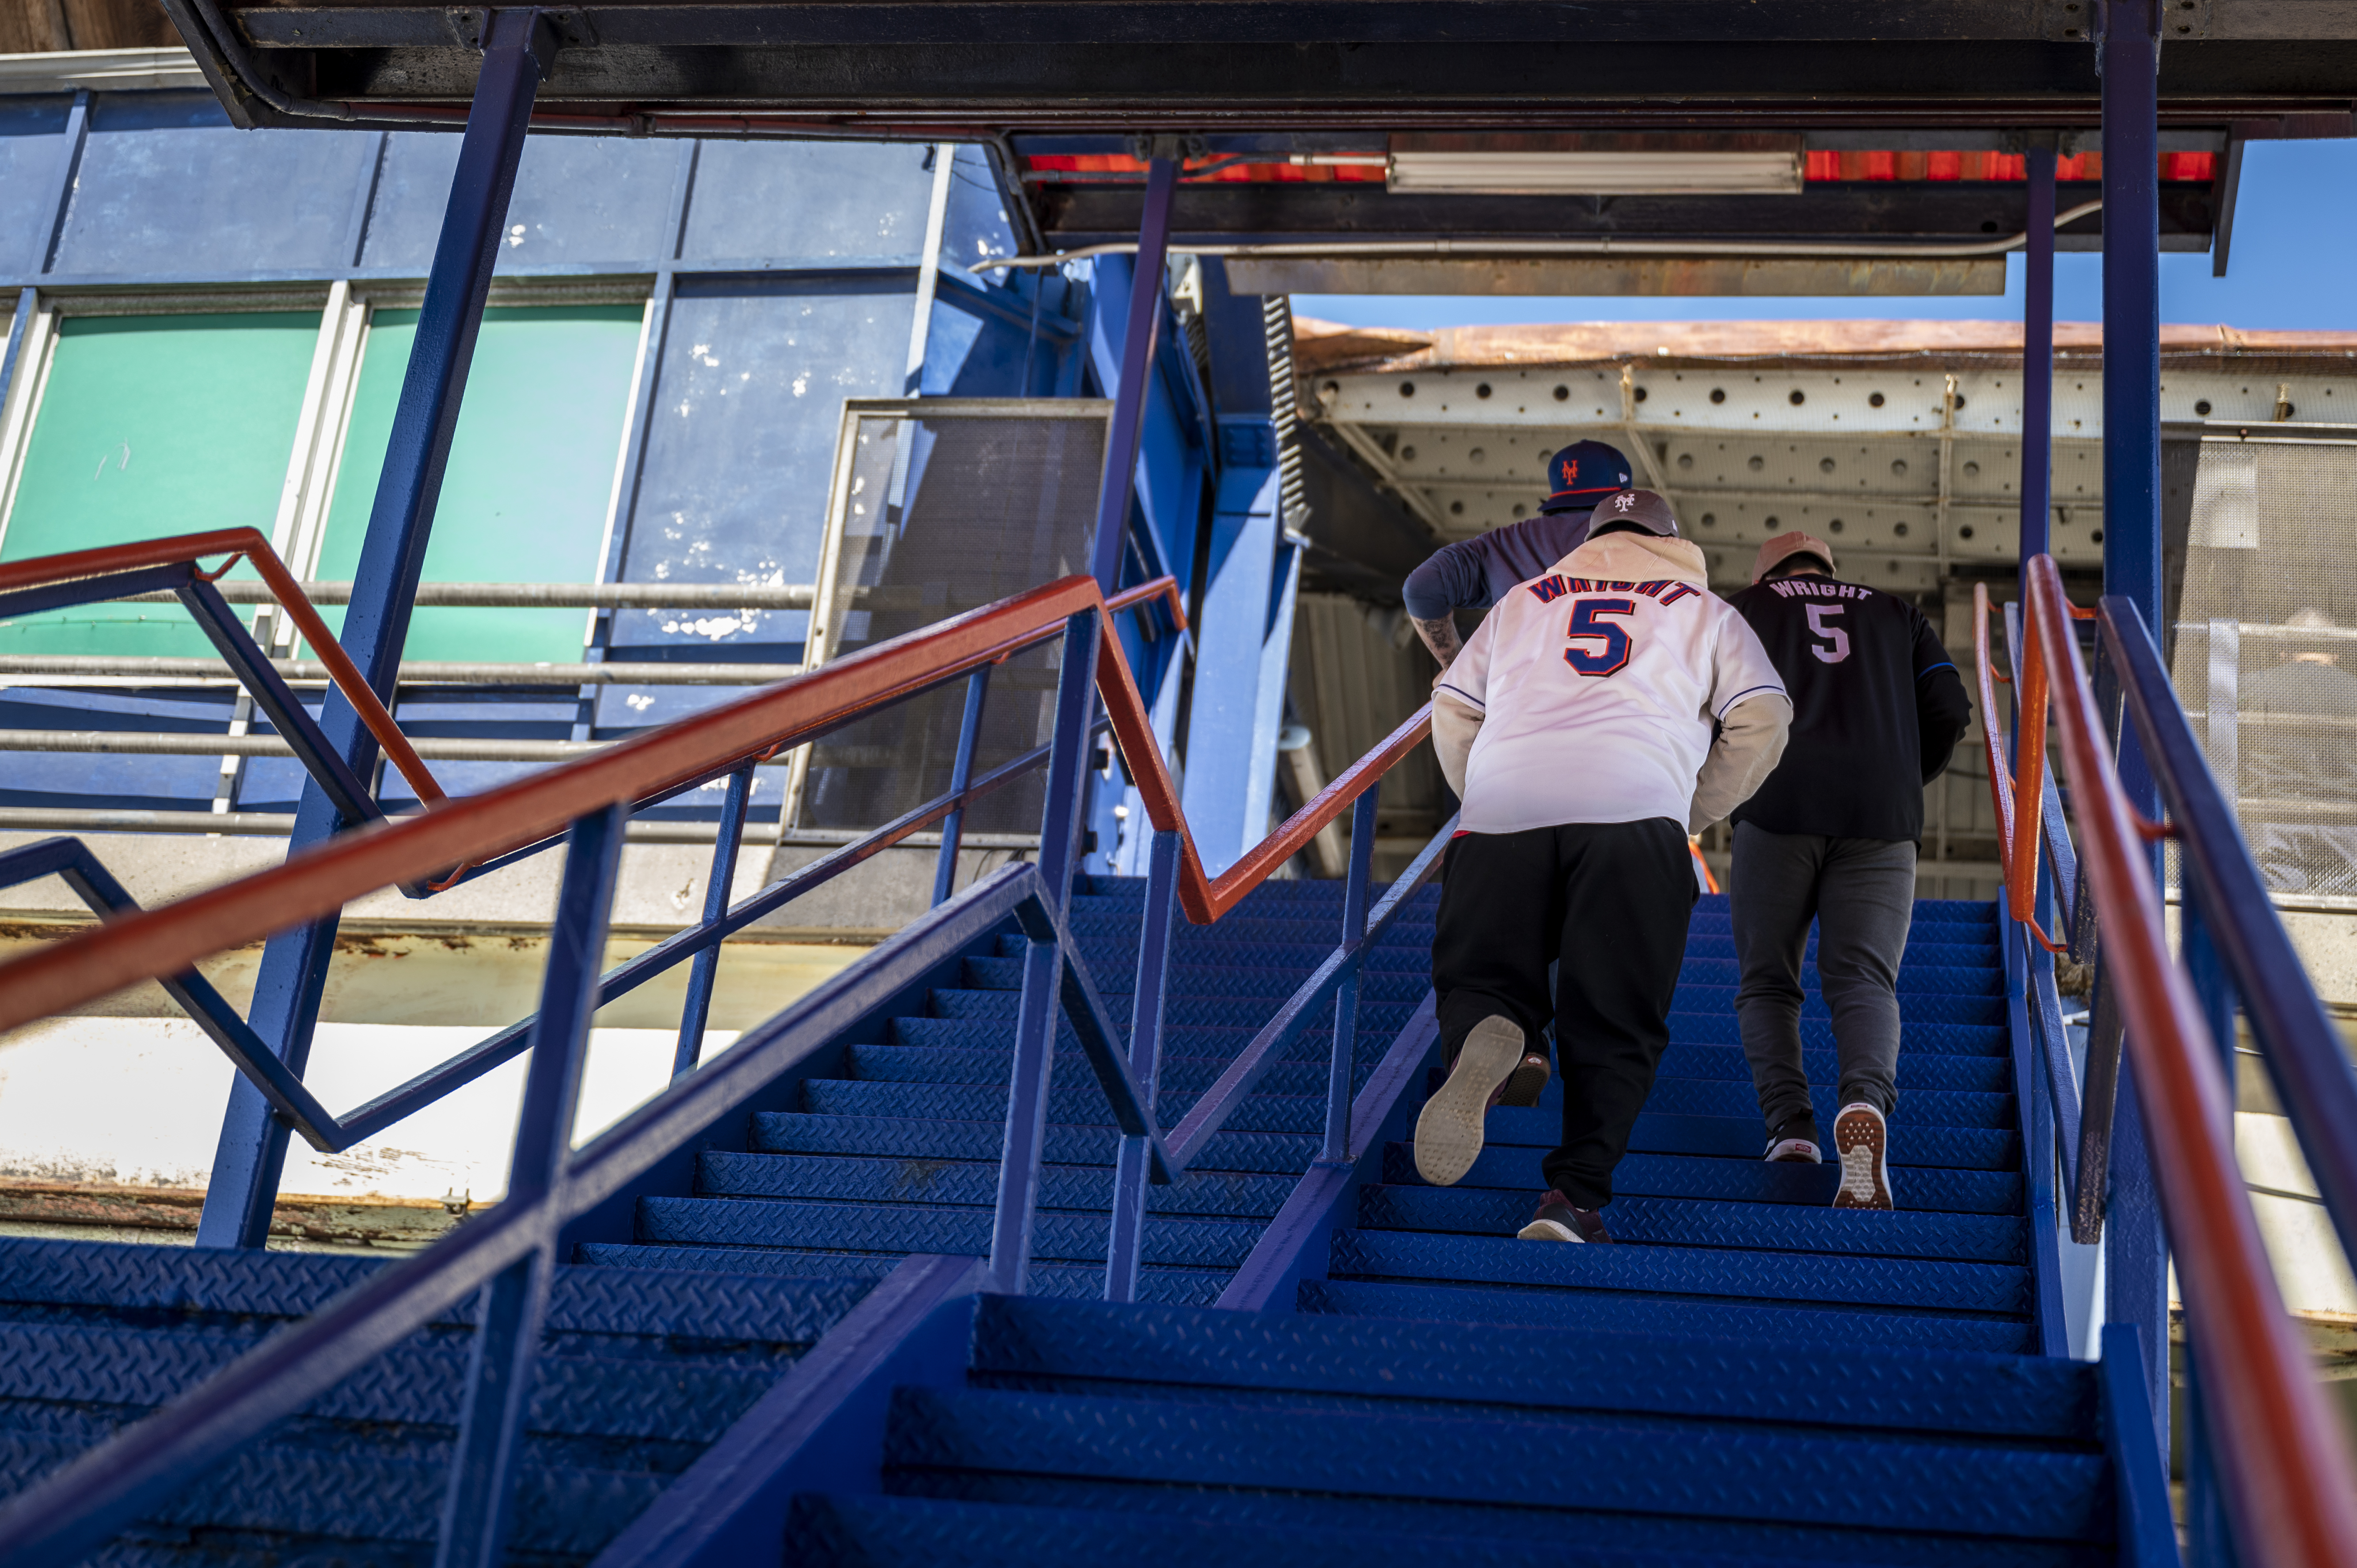 Baseball fans exit LIRR's Mets-Willets Point Station, April 13, 2021.